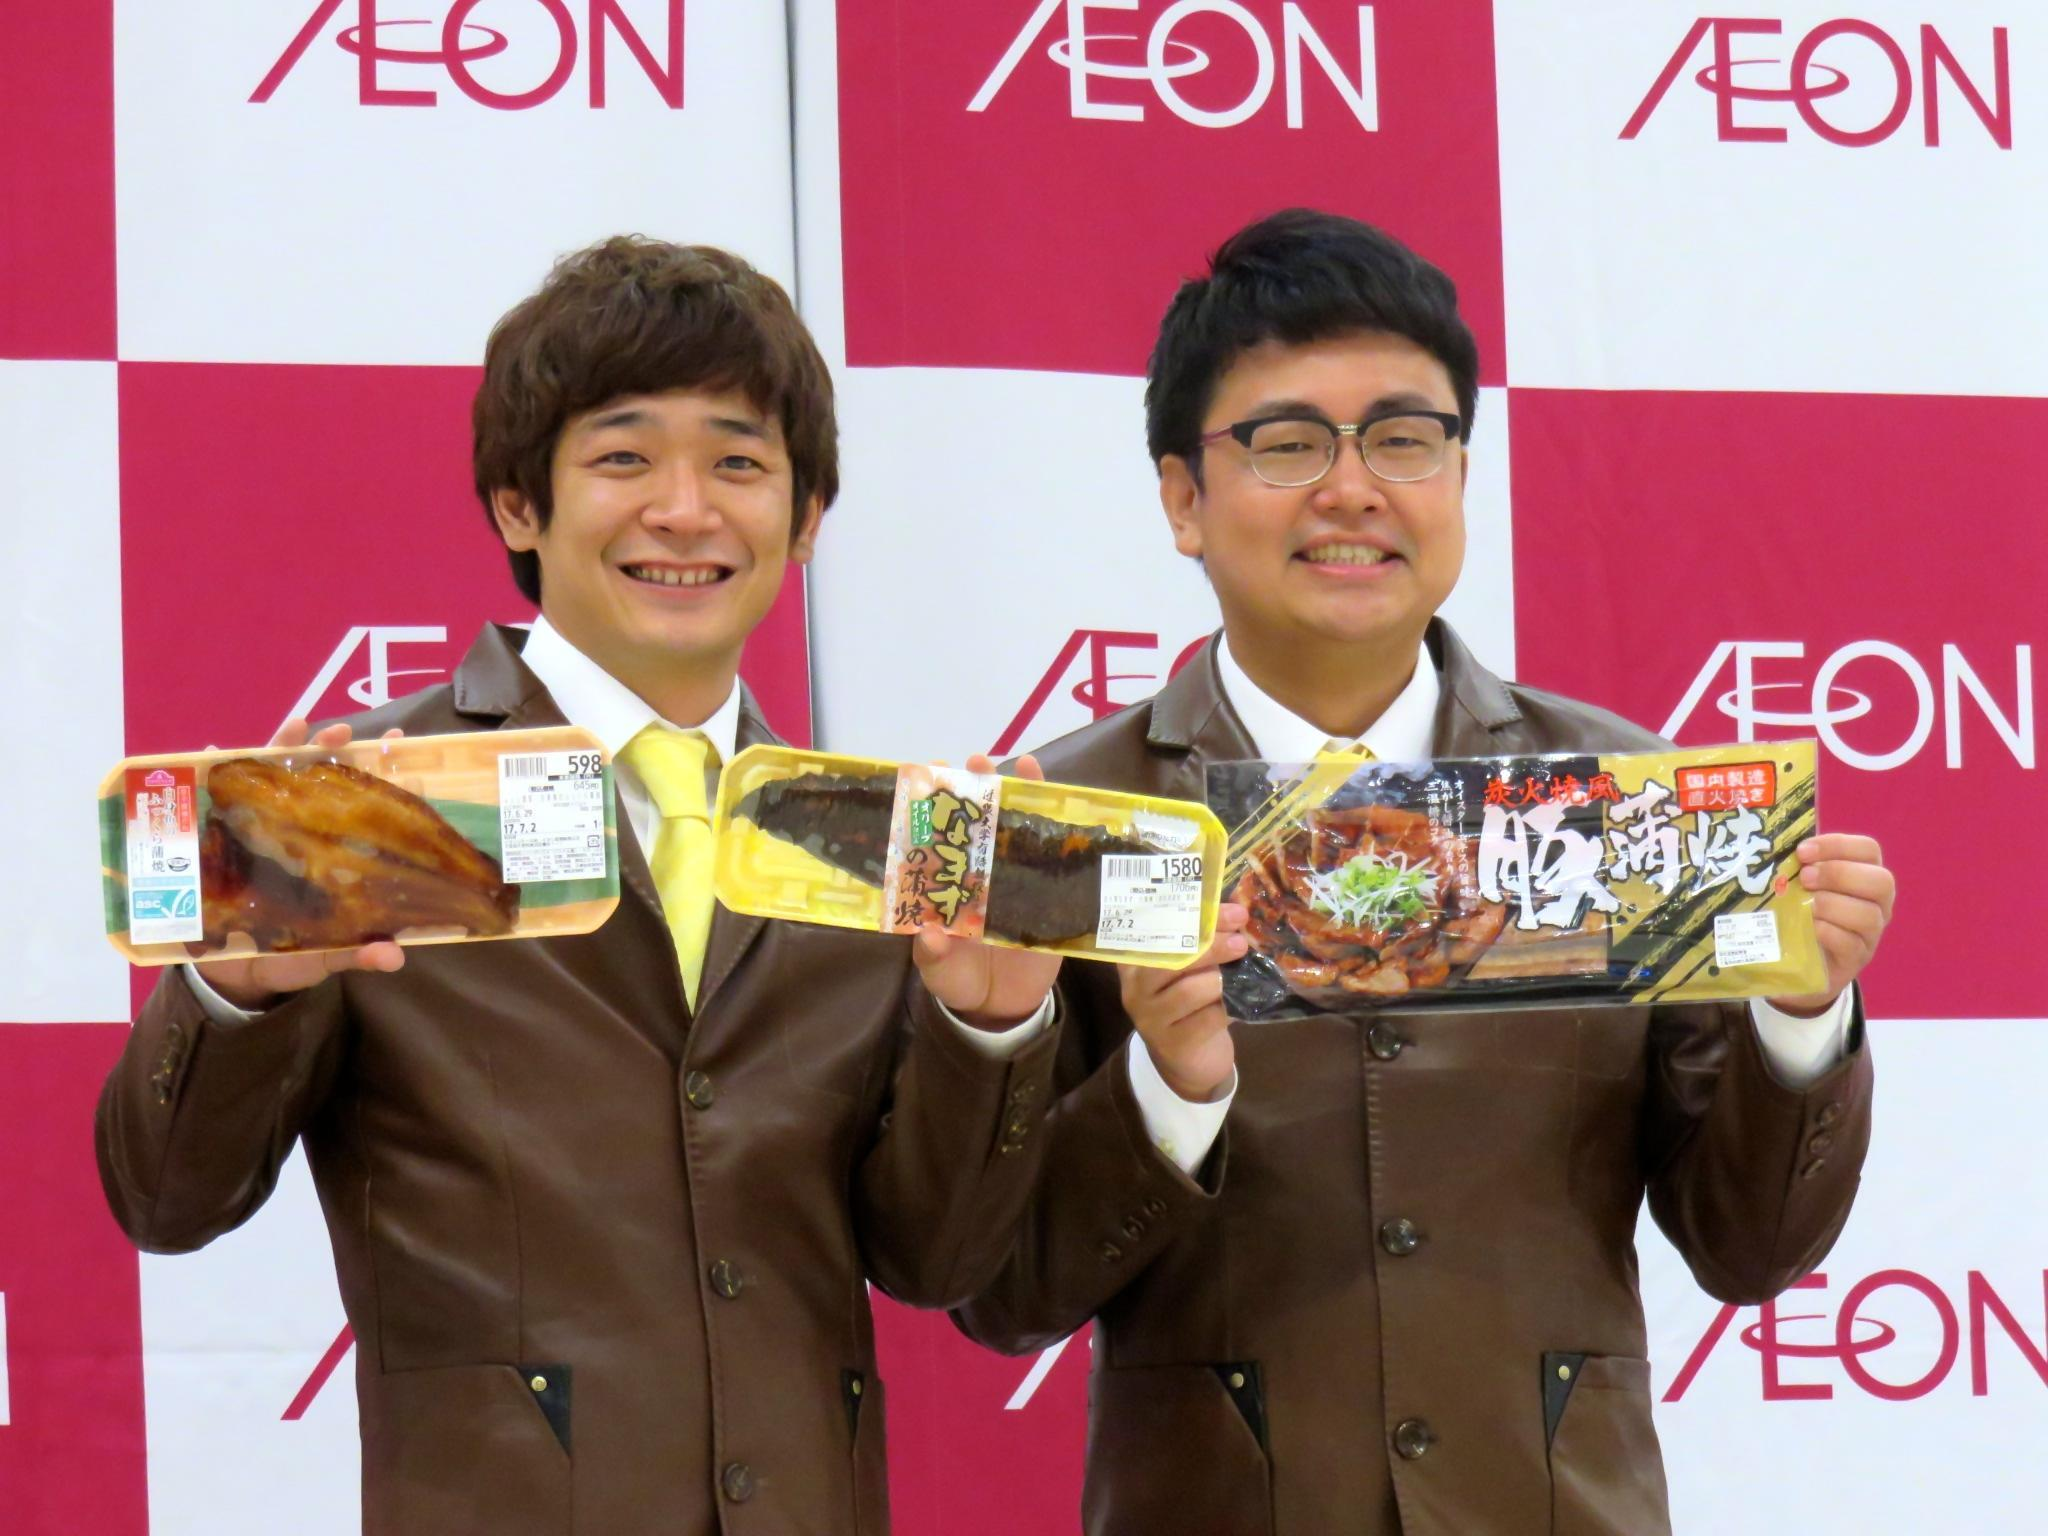 http://news.yoshimoto.co.jp/20170629151752-9f5f22b8cee56aac0f9f59ce83c195ce4d8e7f36.jpg